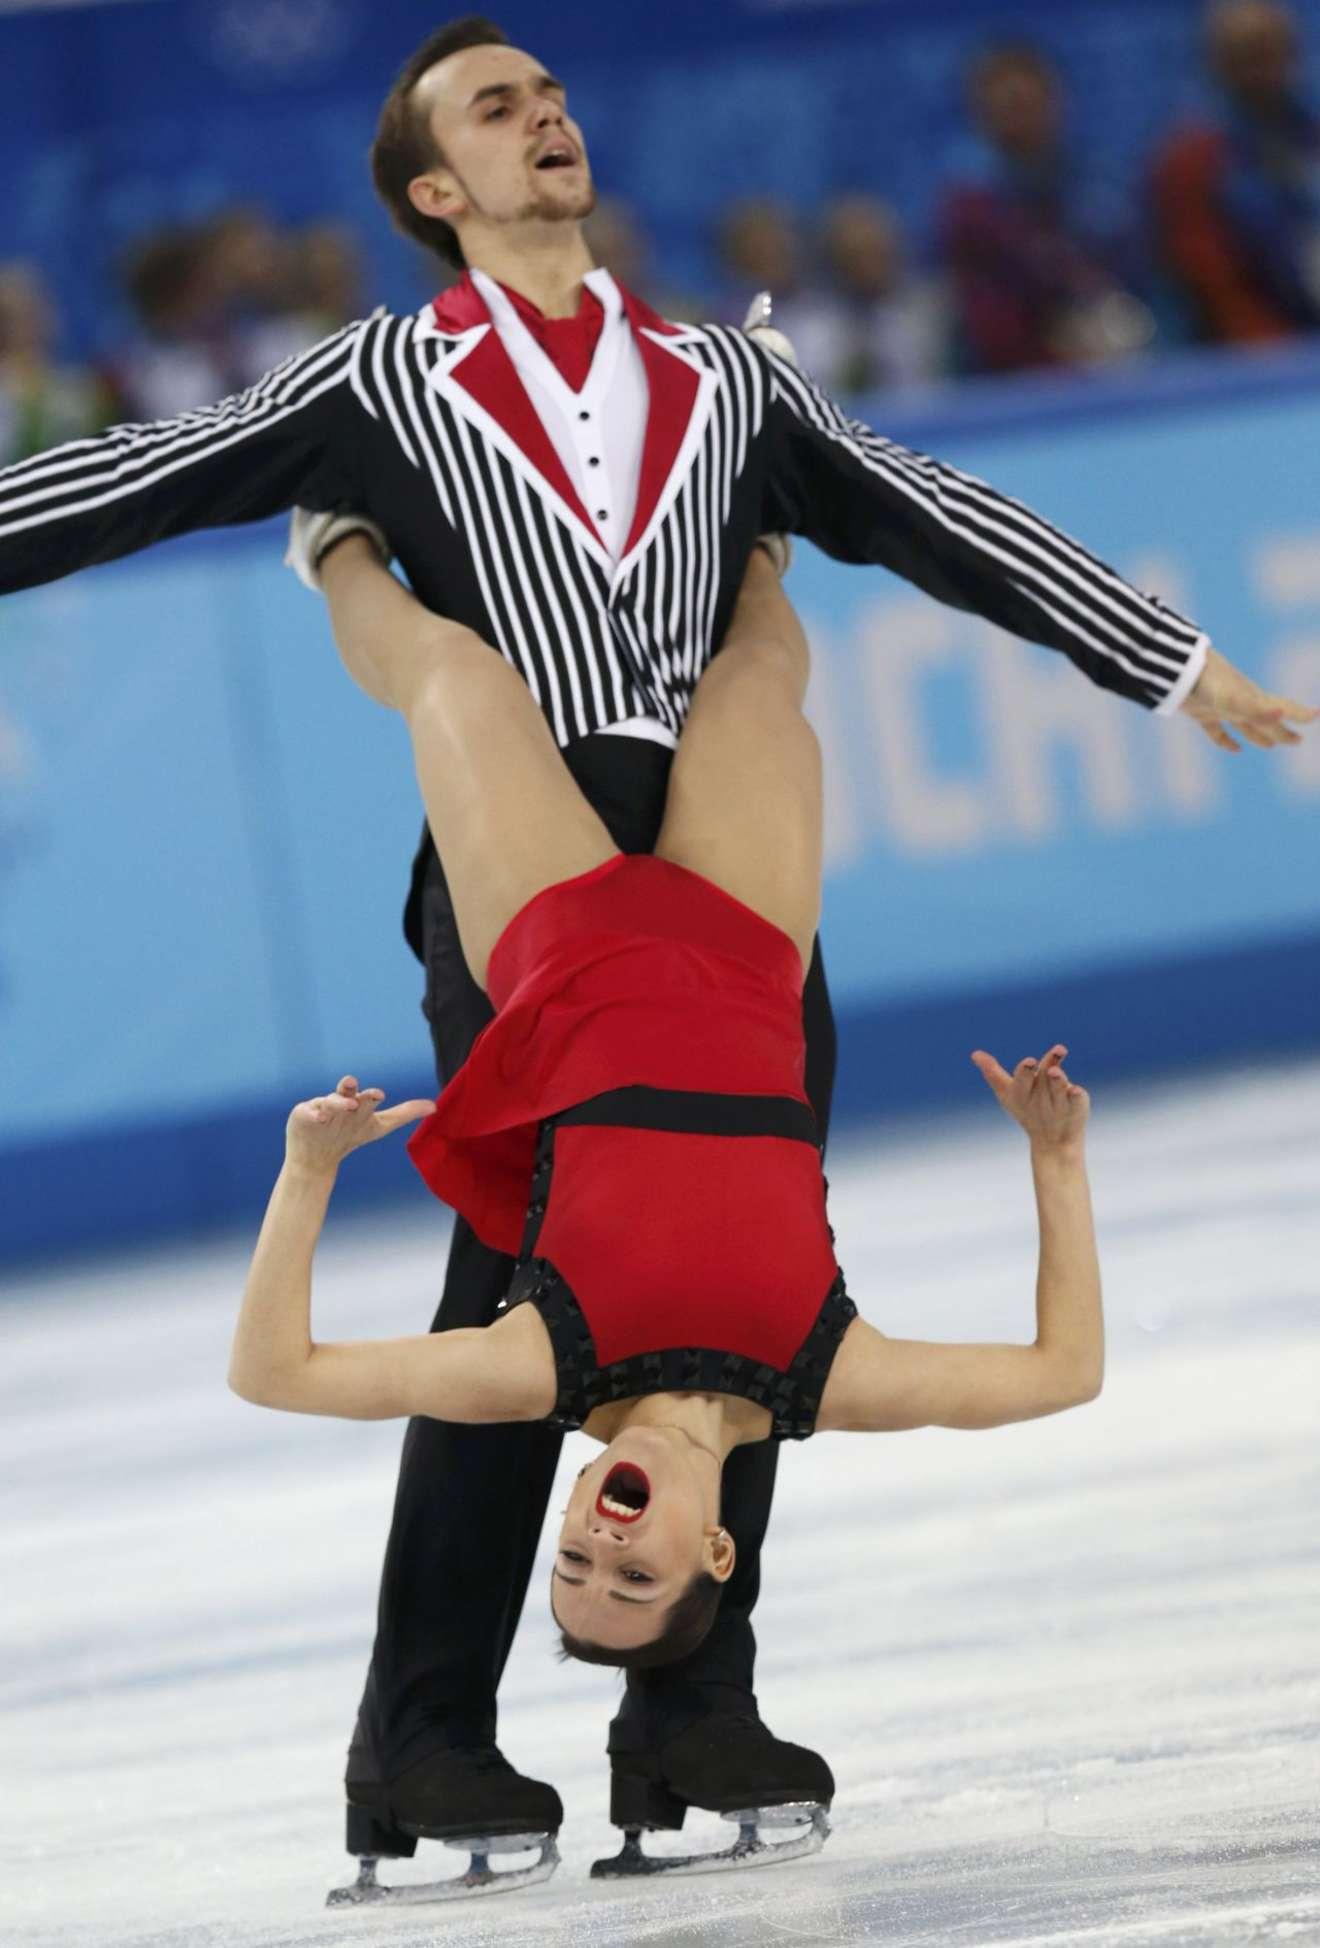 Ksenia Stolbova Sochi Winter Olympics Gotceleb